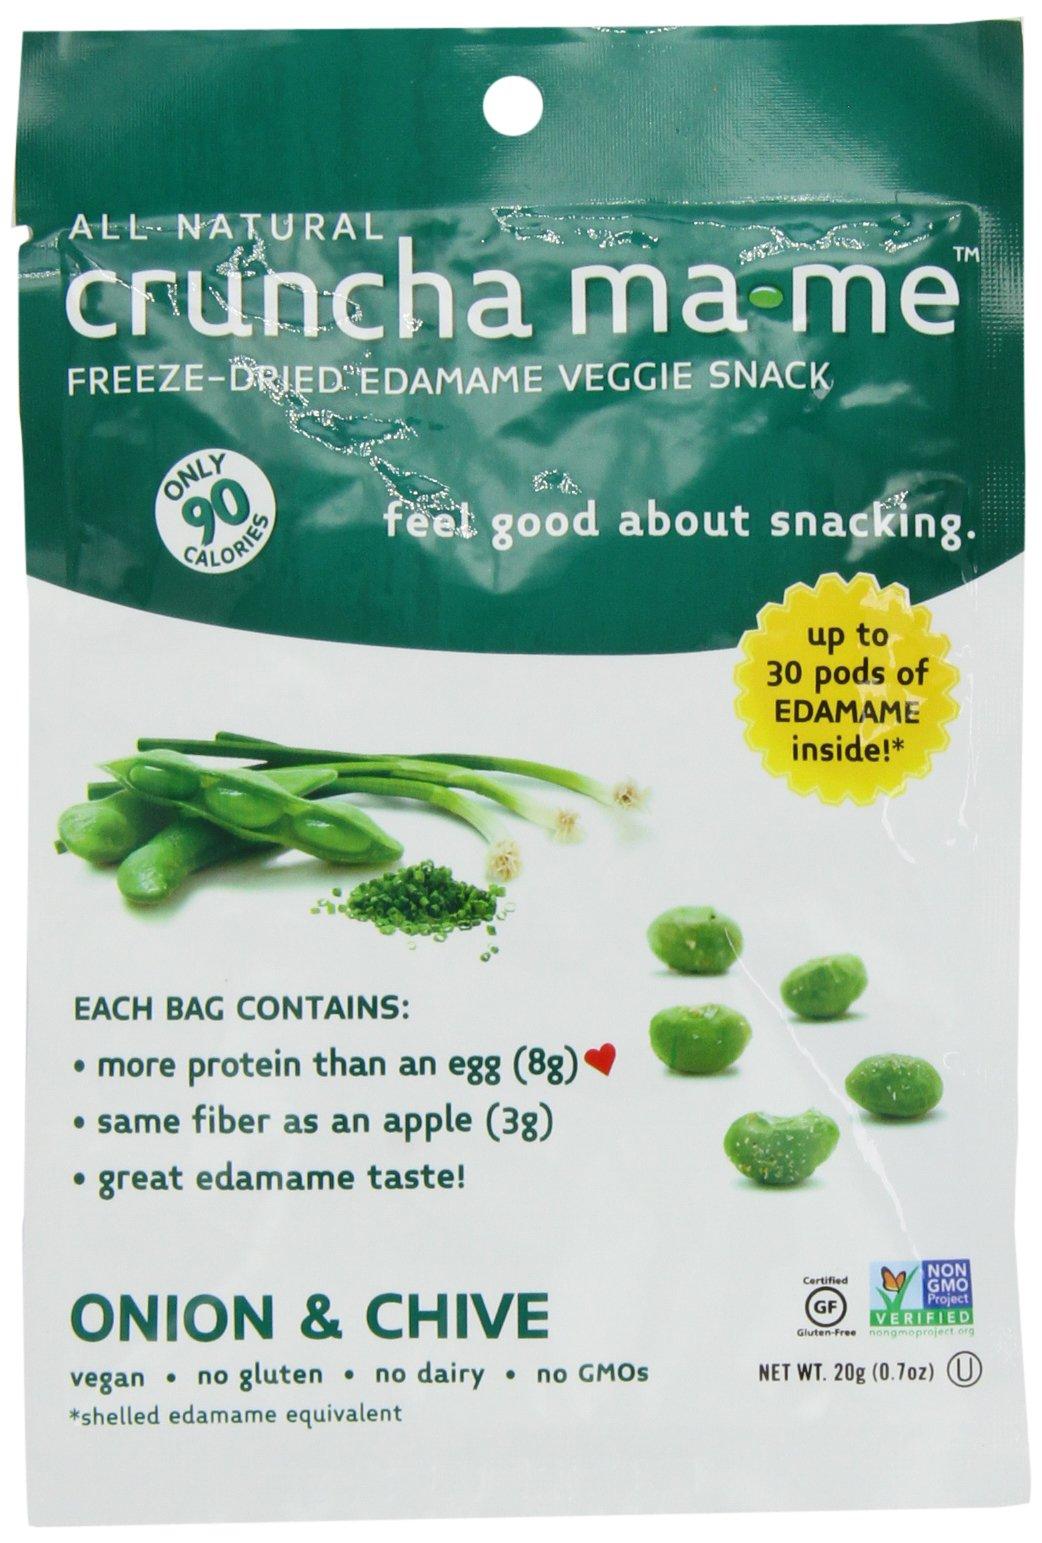 Eda-Zen Cruncha ma-me Edamame Veggie Snack, Onion & Chive, 0.7 Ounce (Pack of 8)